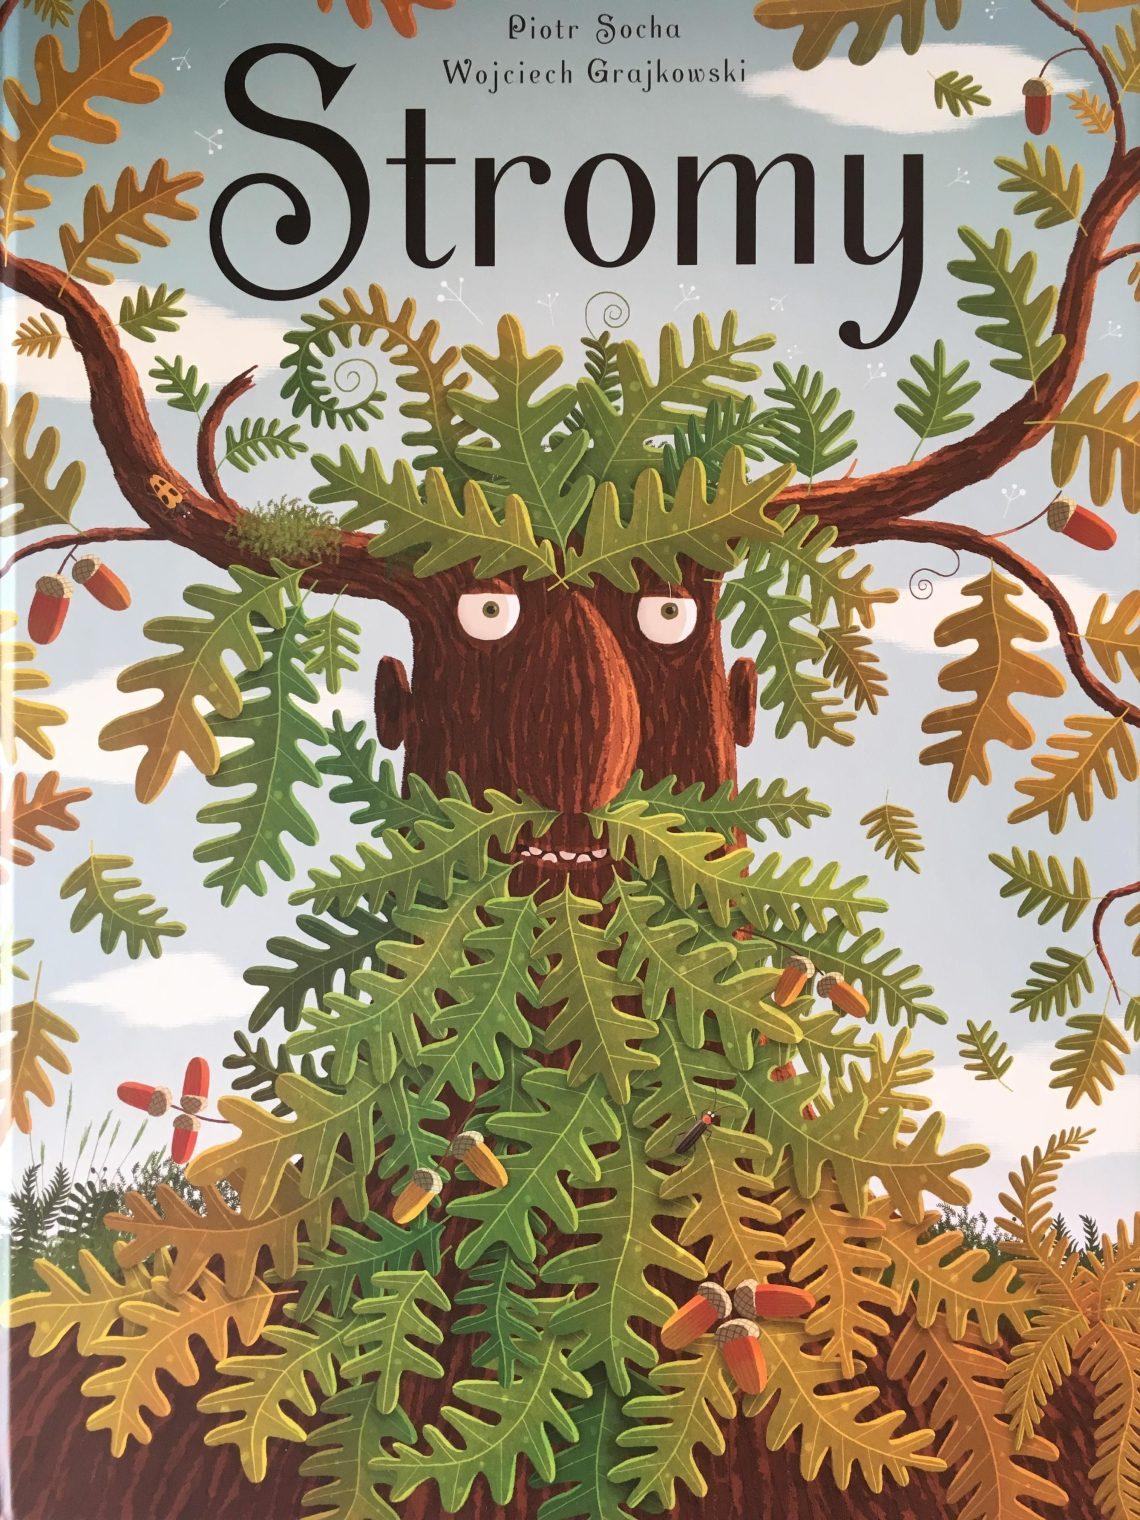 Včely a stromy podle Piotra Sochy